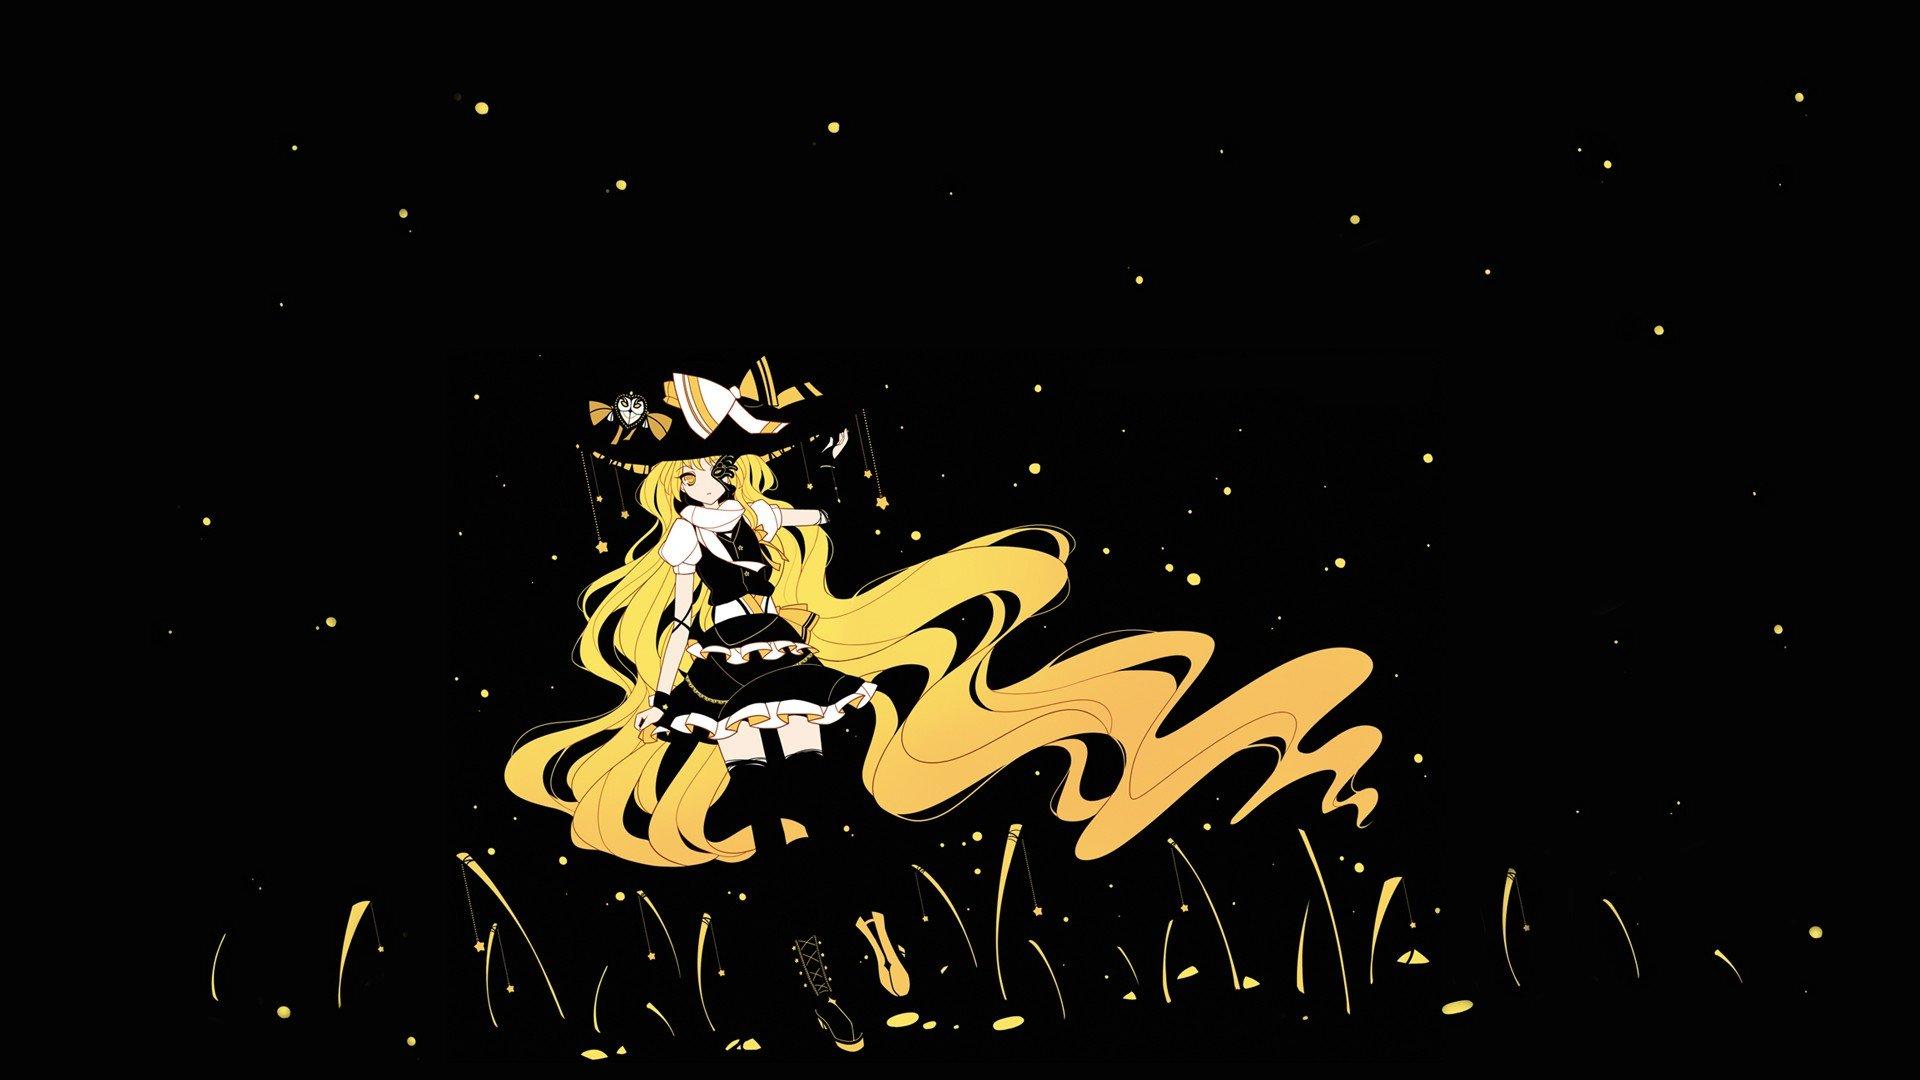 Anime Colorful Touhou Kirisame Marisa Anime Girls Hd Wallpapers Desktop And Mobile Images Photos